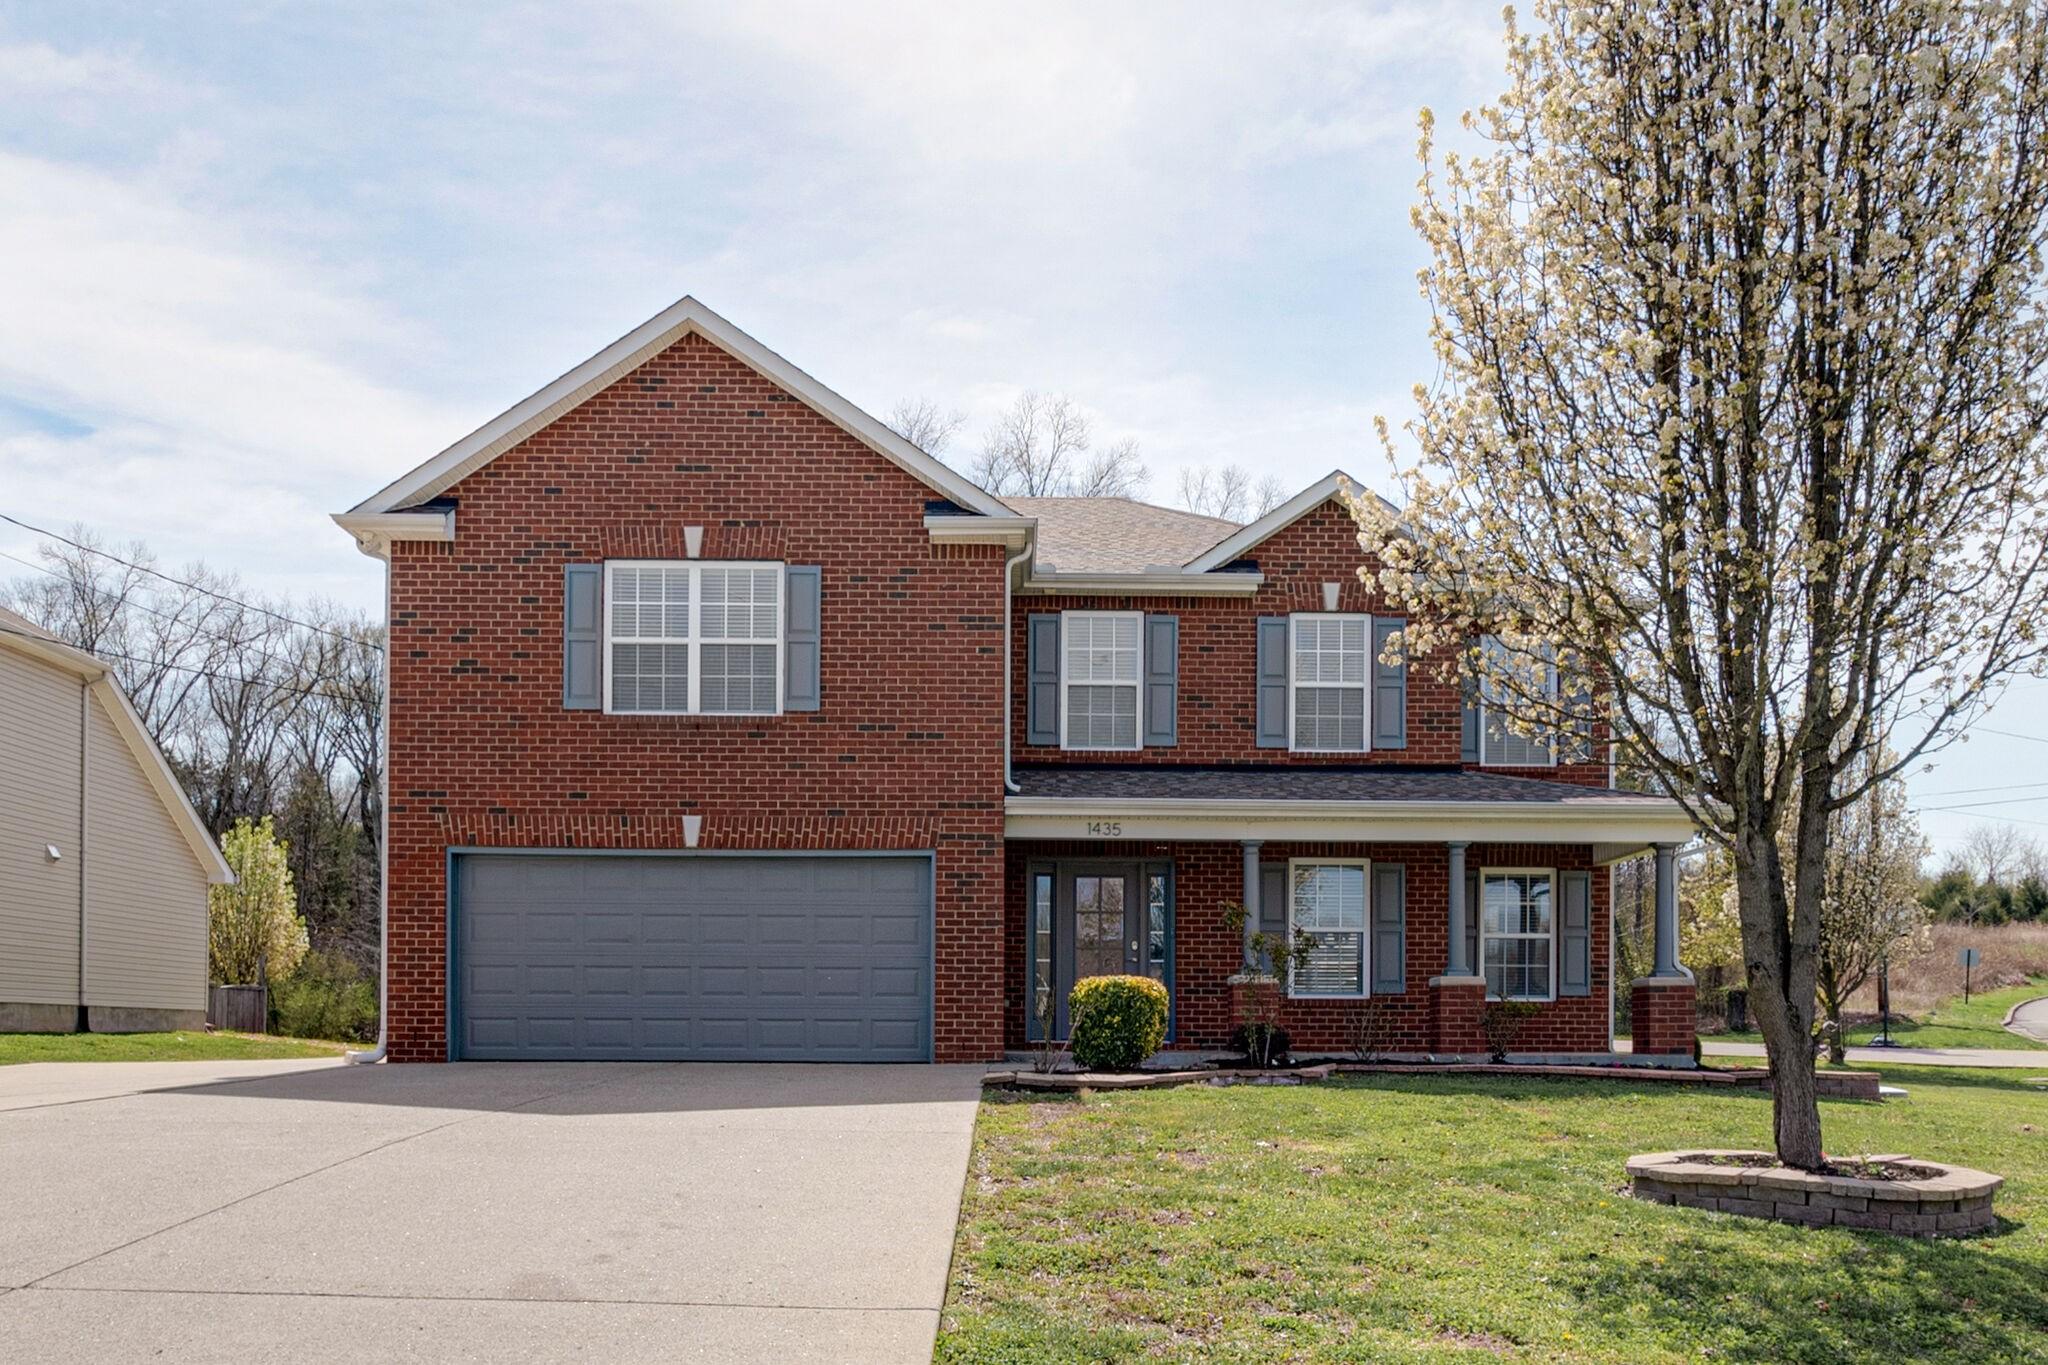 1435 E Nir Shreibman Blvd Property Photo - LA VERGNE, TN real estate listing